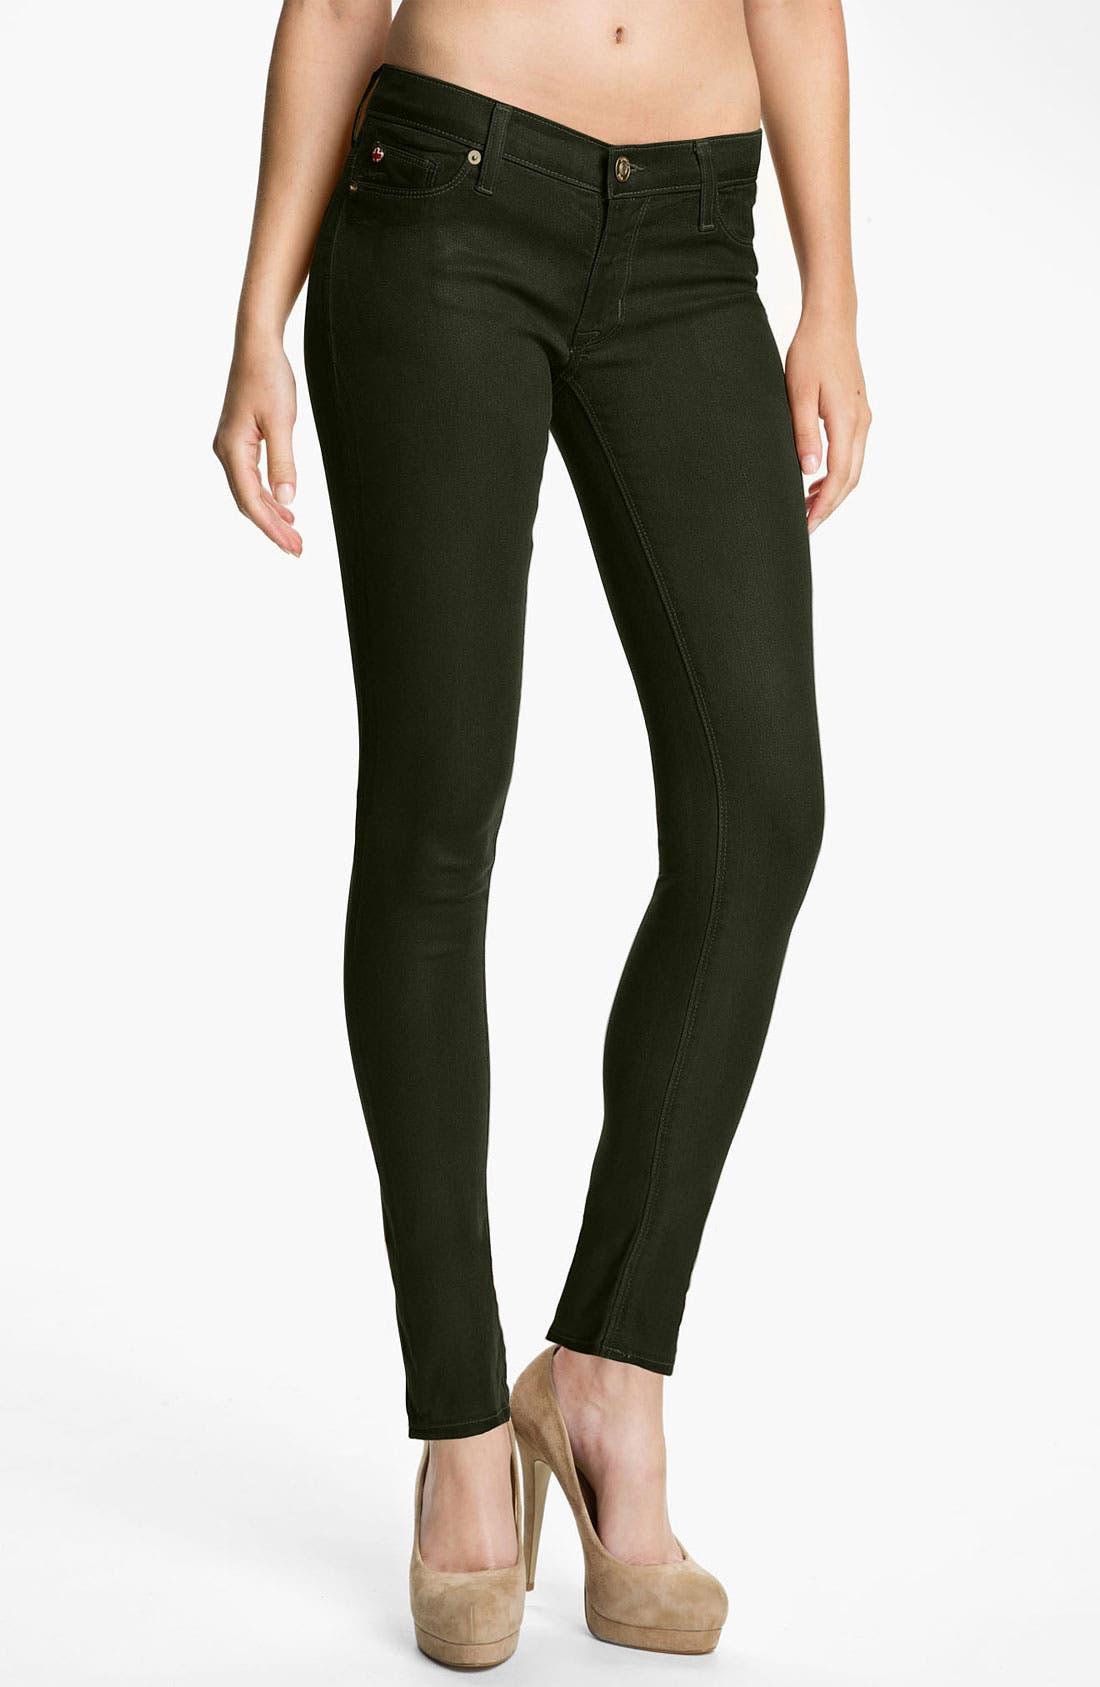 Alternate Image 1 Selected - Hudson Jeans 'Krista' Super Skinny Jeans (Fern Wax)